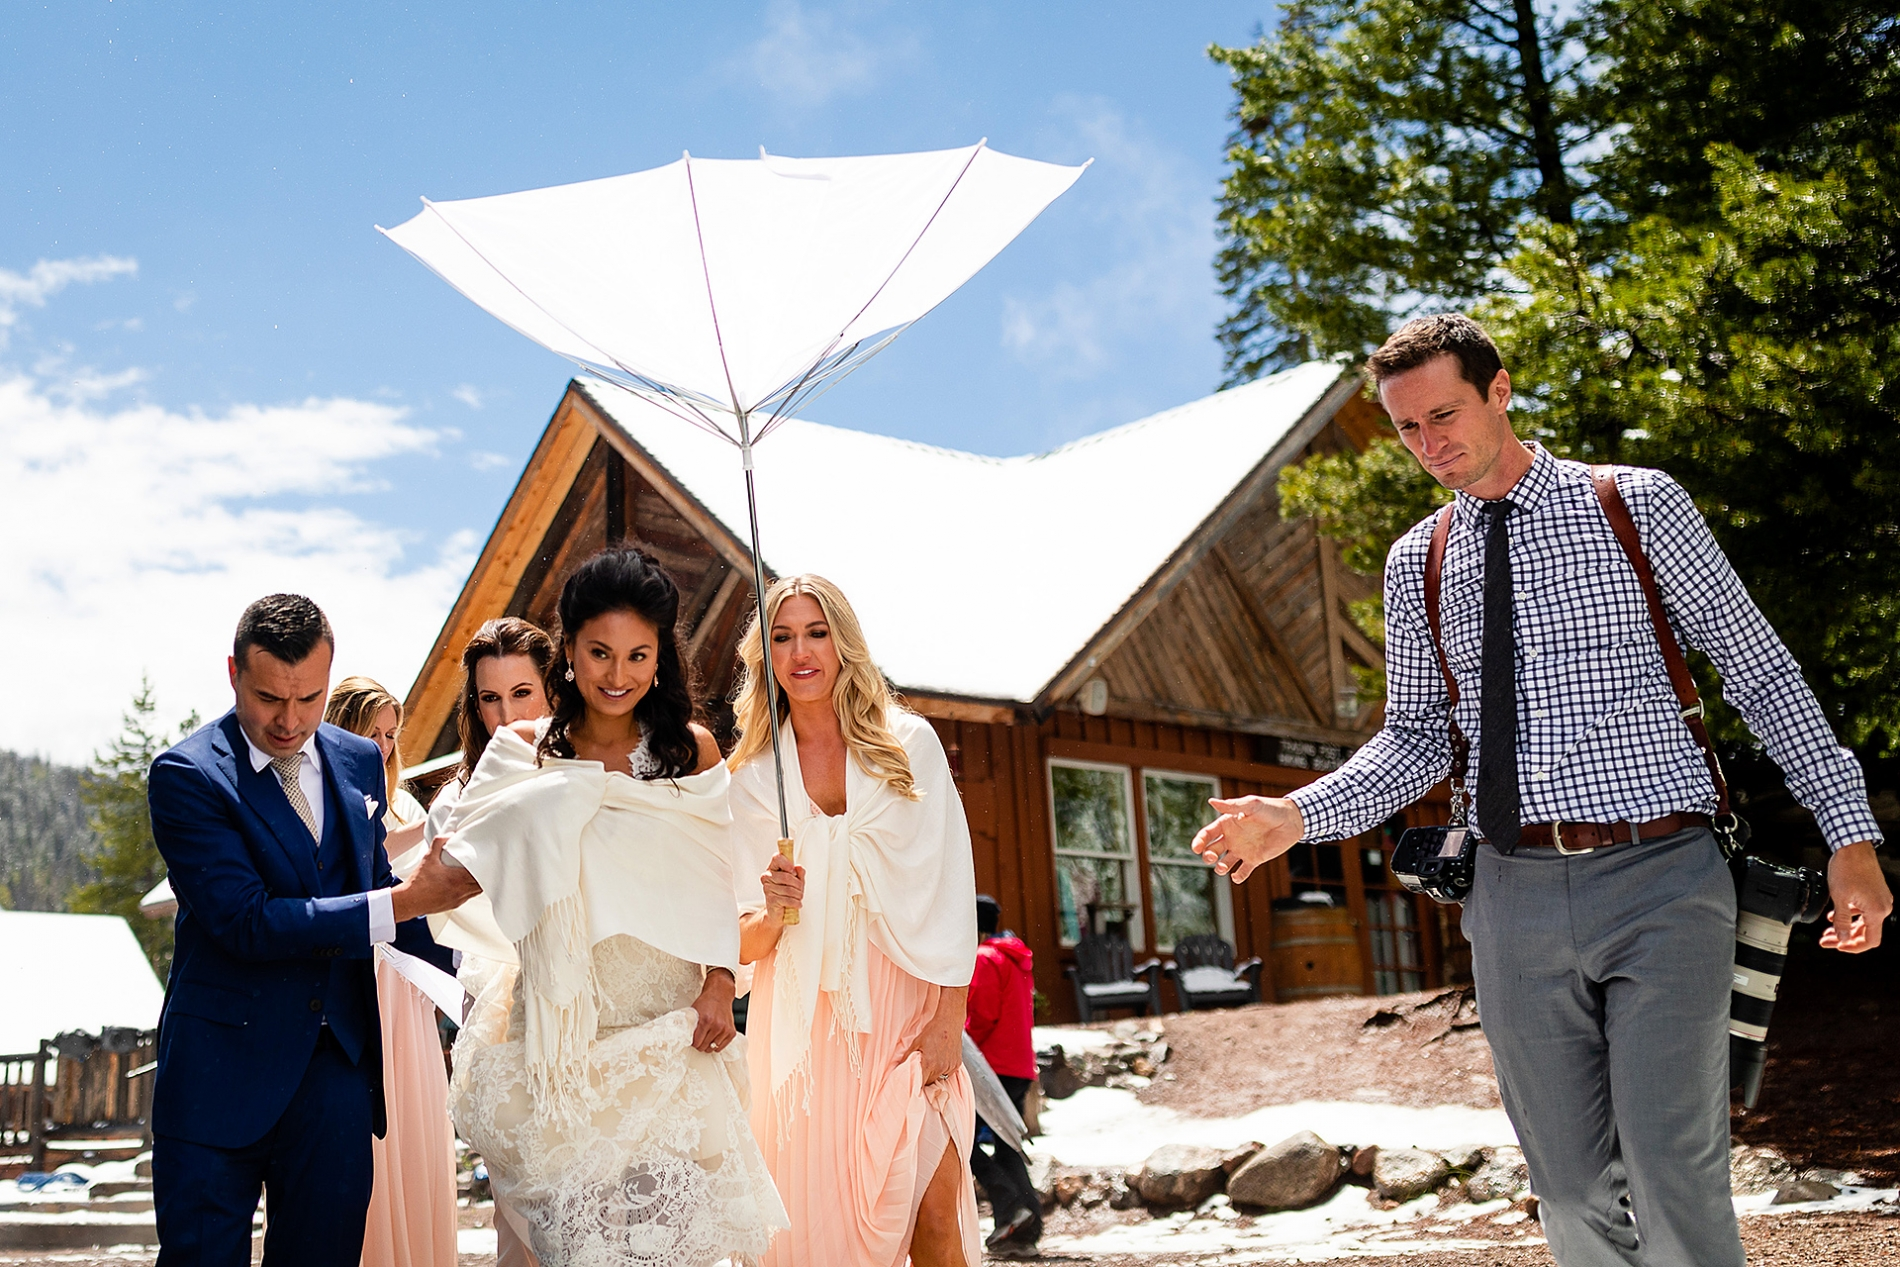 Silverthorne Colorado photographer at wedding walking with the bride under an umbrella.